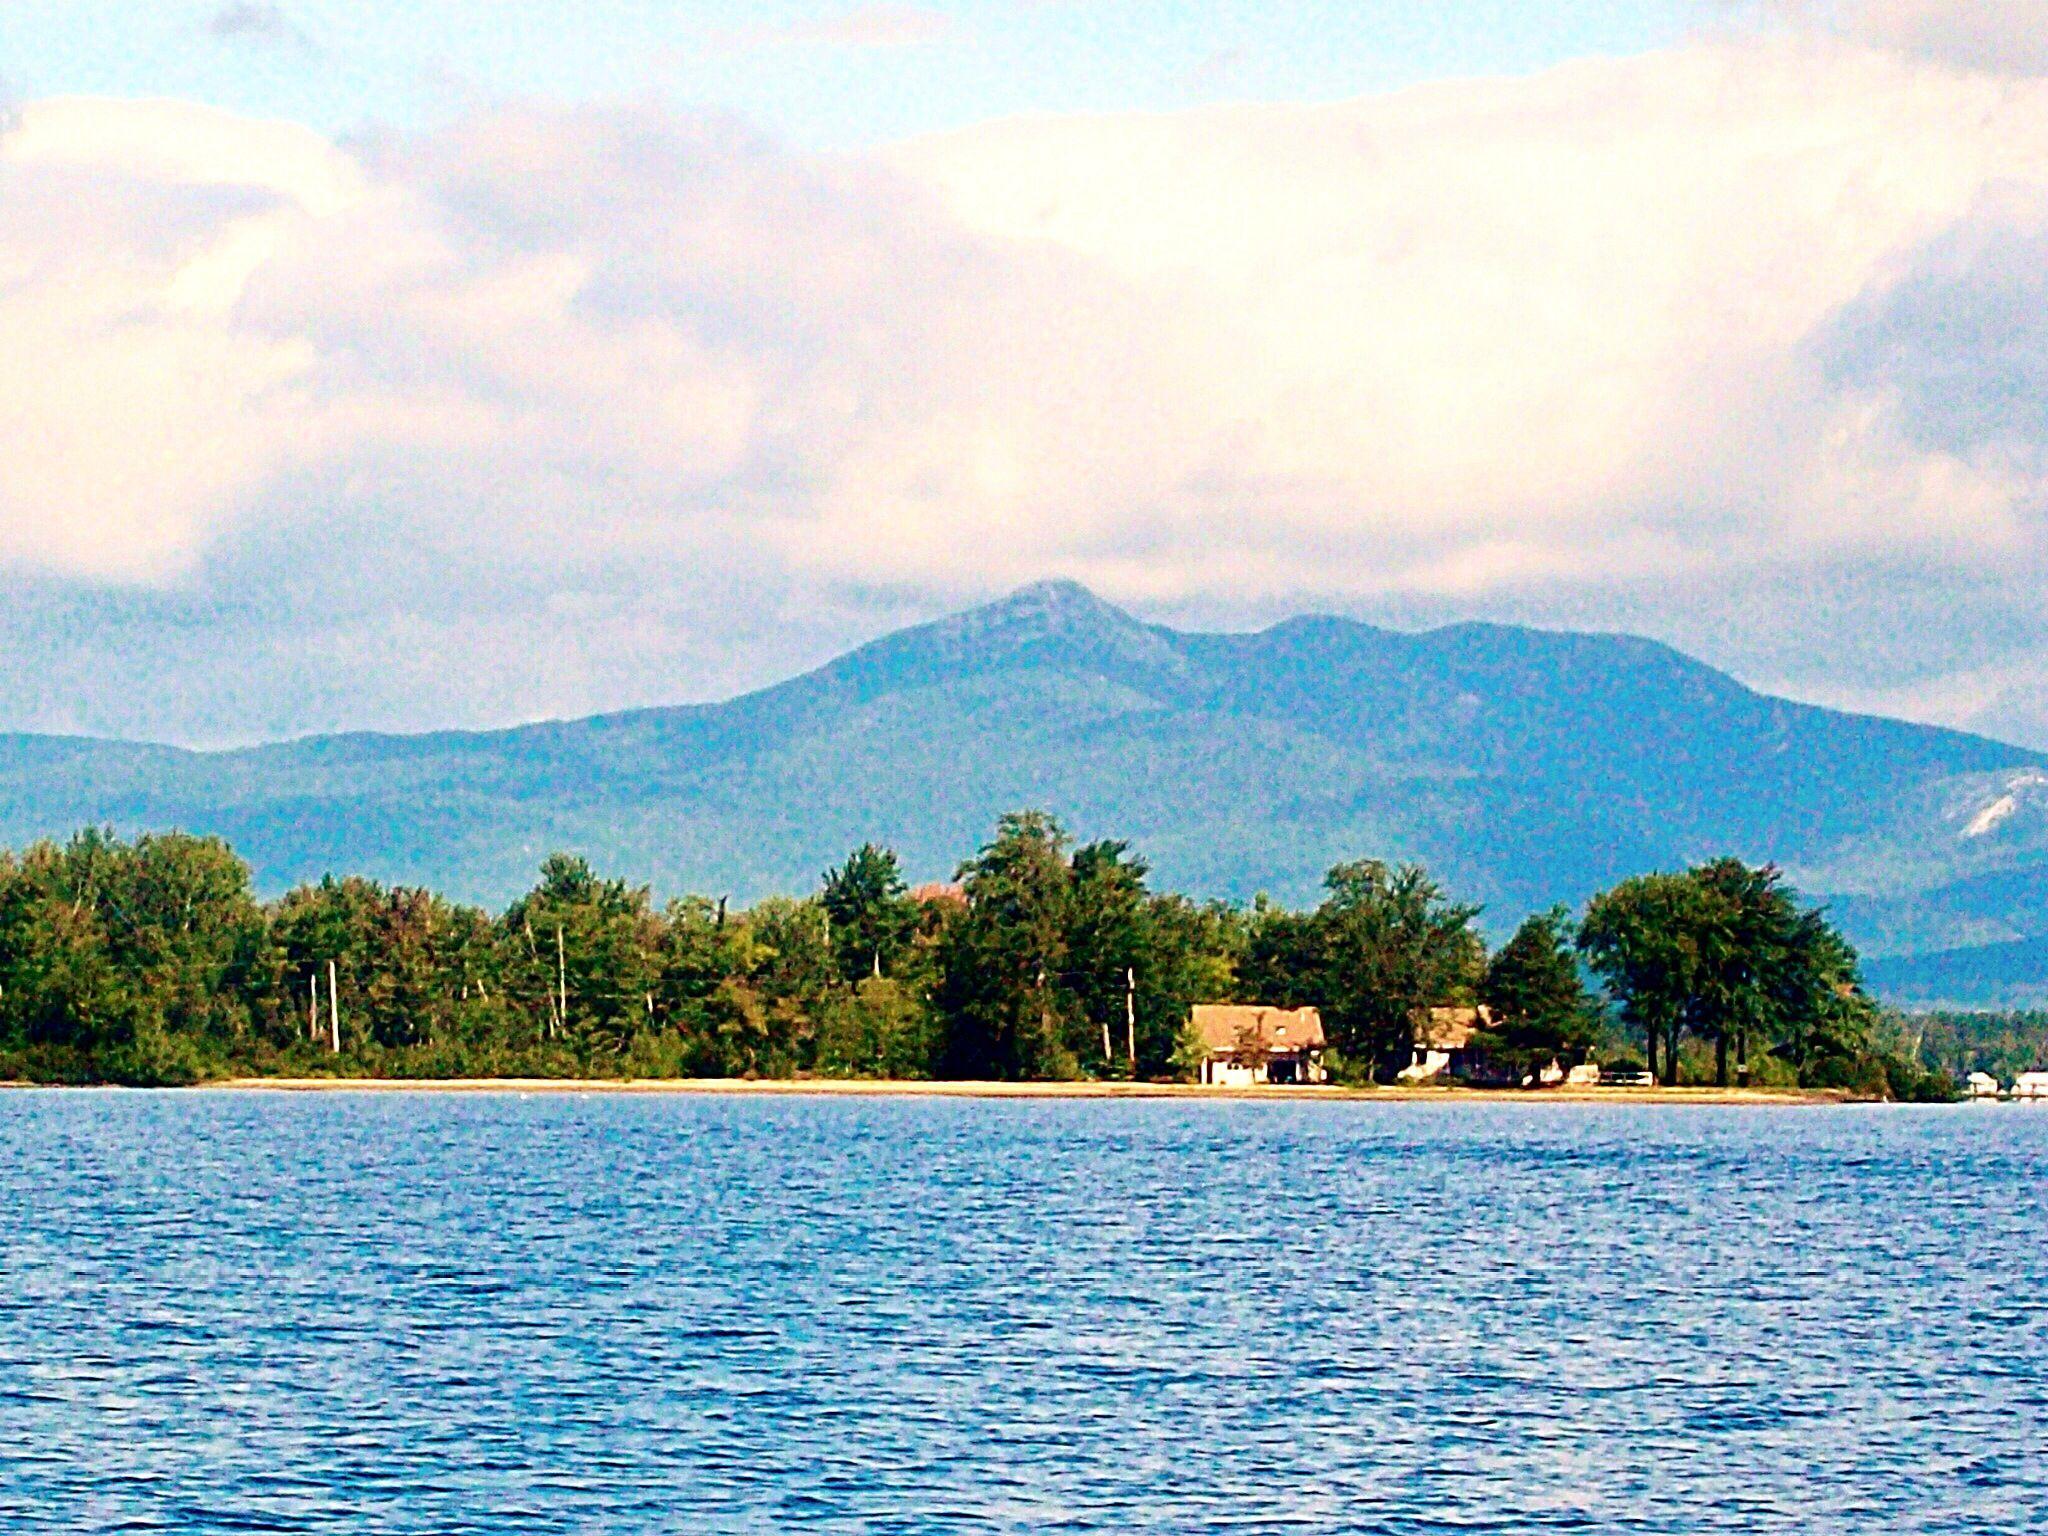 Mt Chocorua Ossipee Lake Ossipee Nh Ossipee Lake Camping Life Ossipee